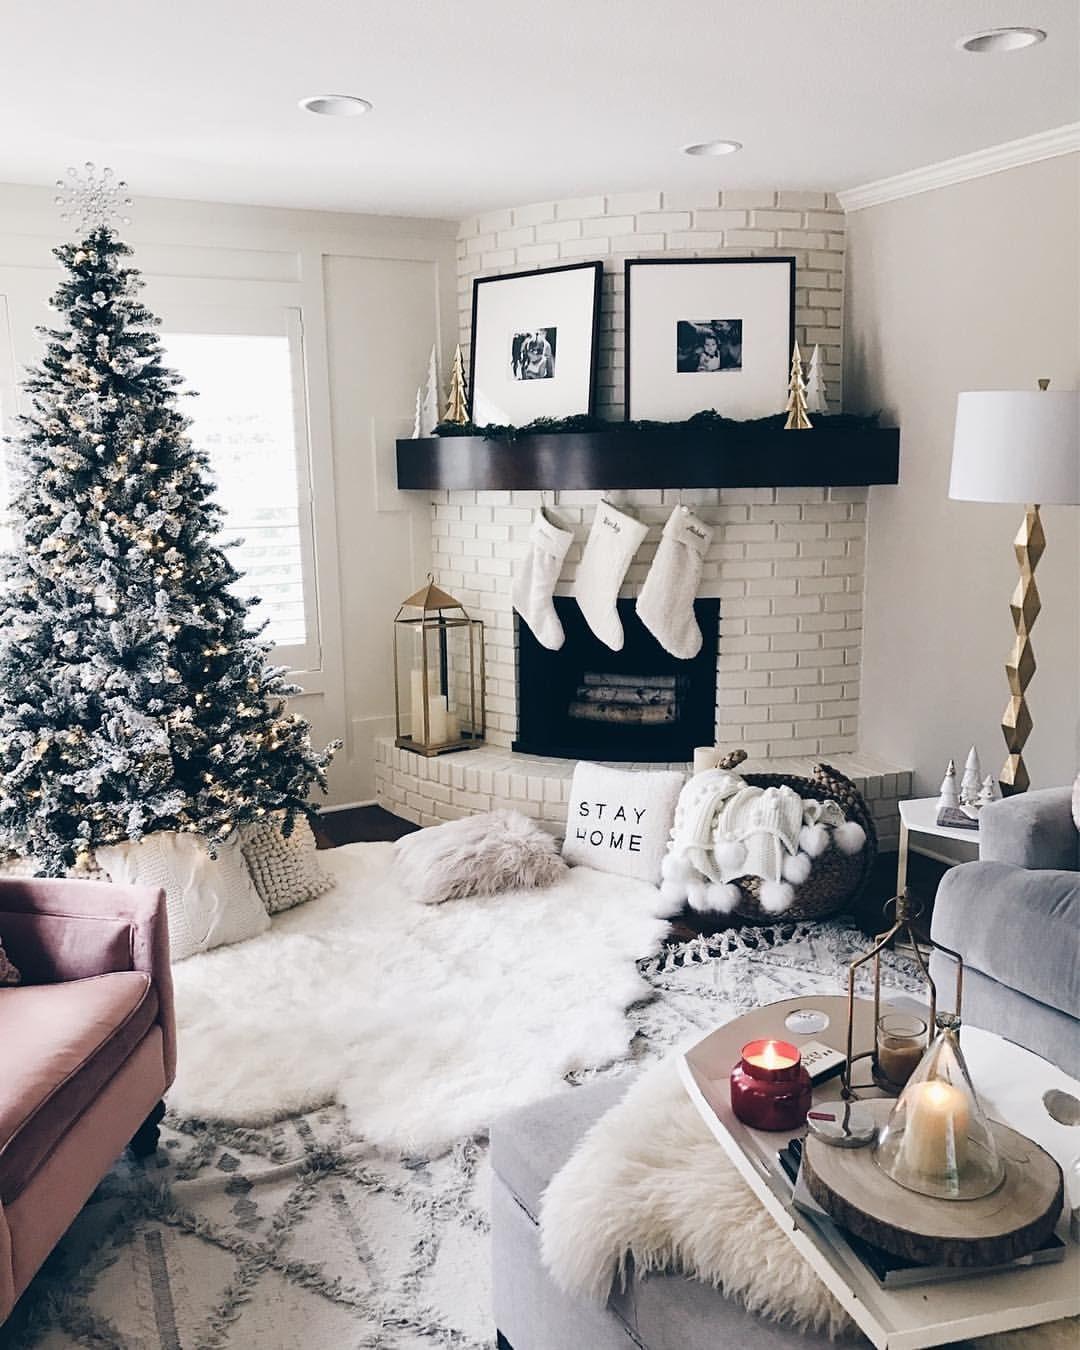 Never too soon for Christmas decor I